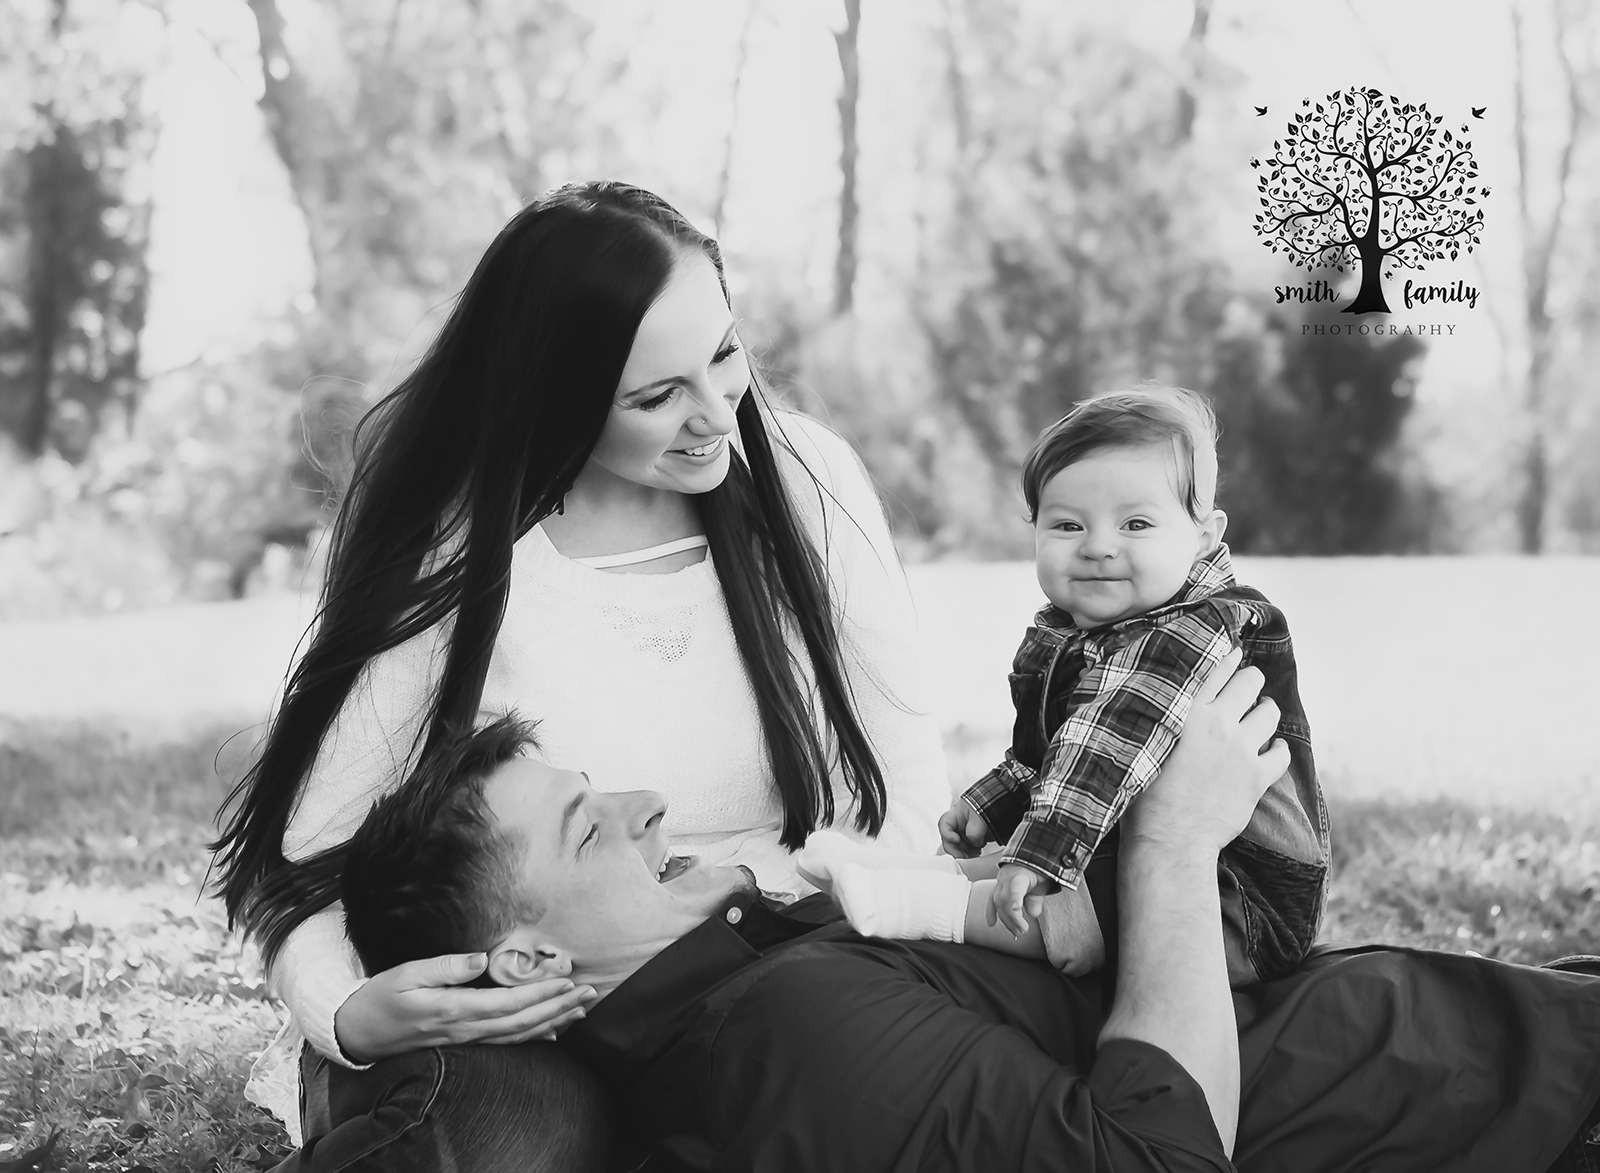 December 2017 - Family/Christmas session